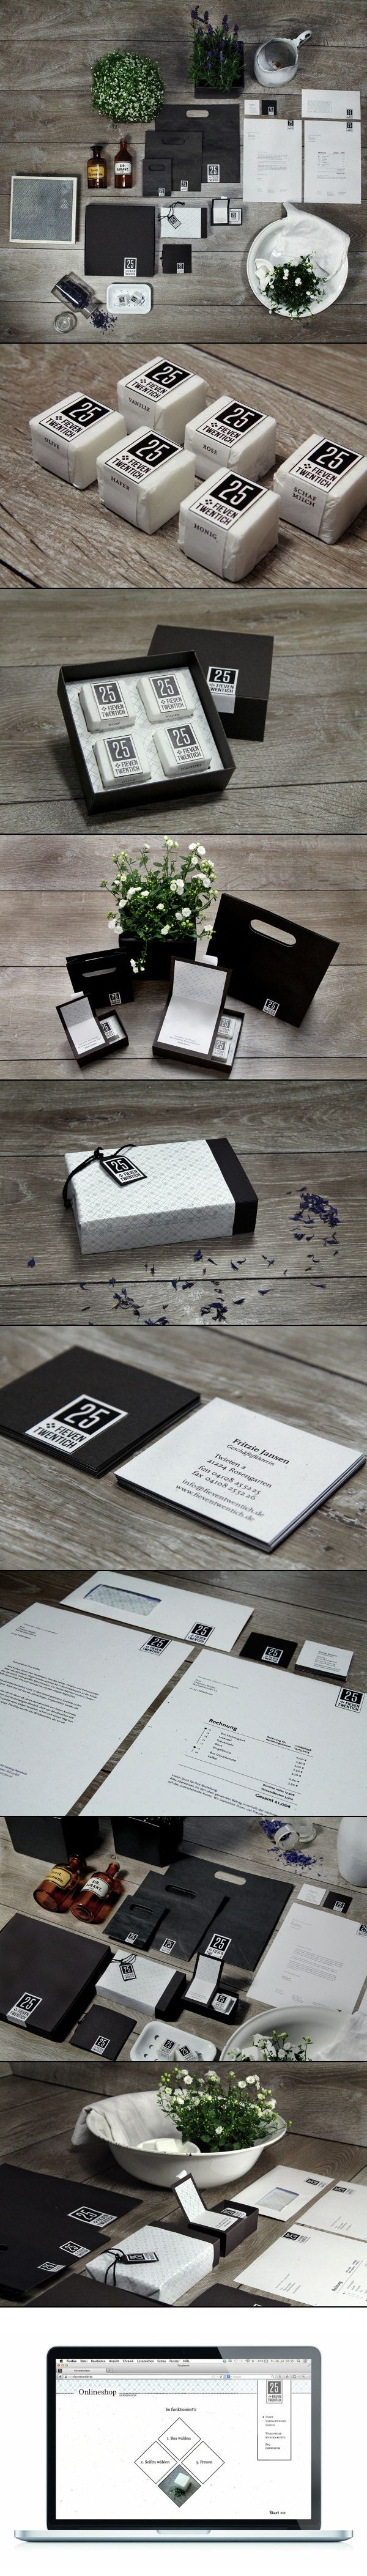 Fieventwentich #identity #packaging #branding PD